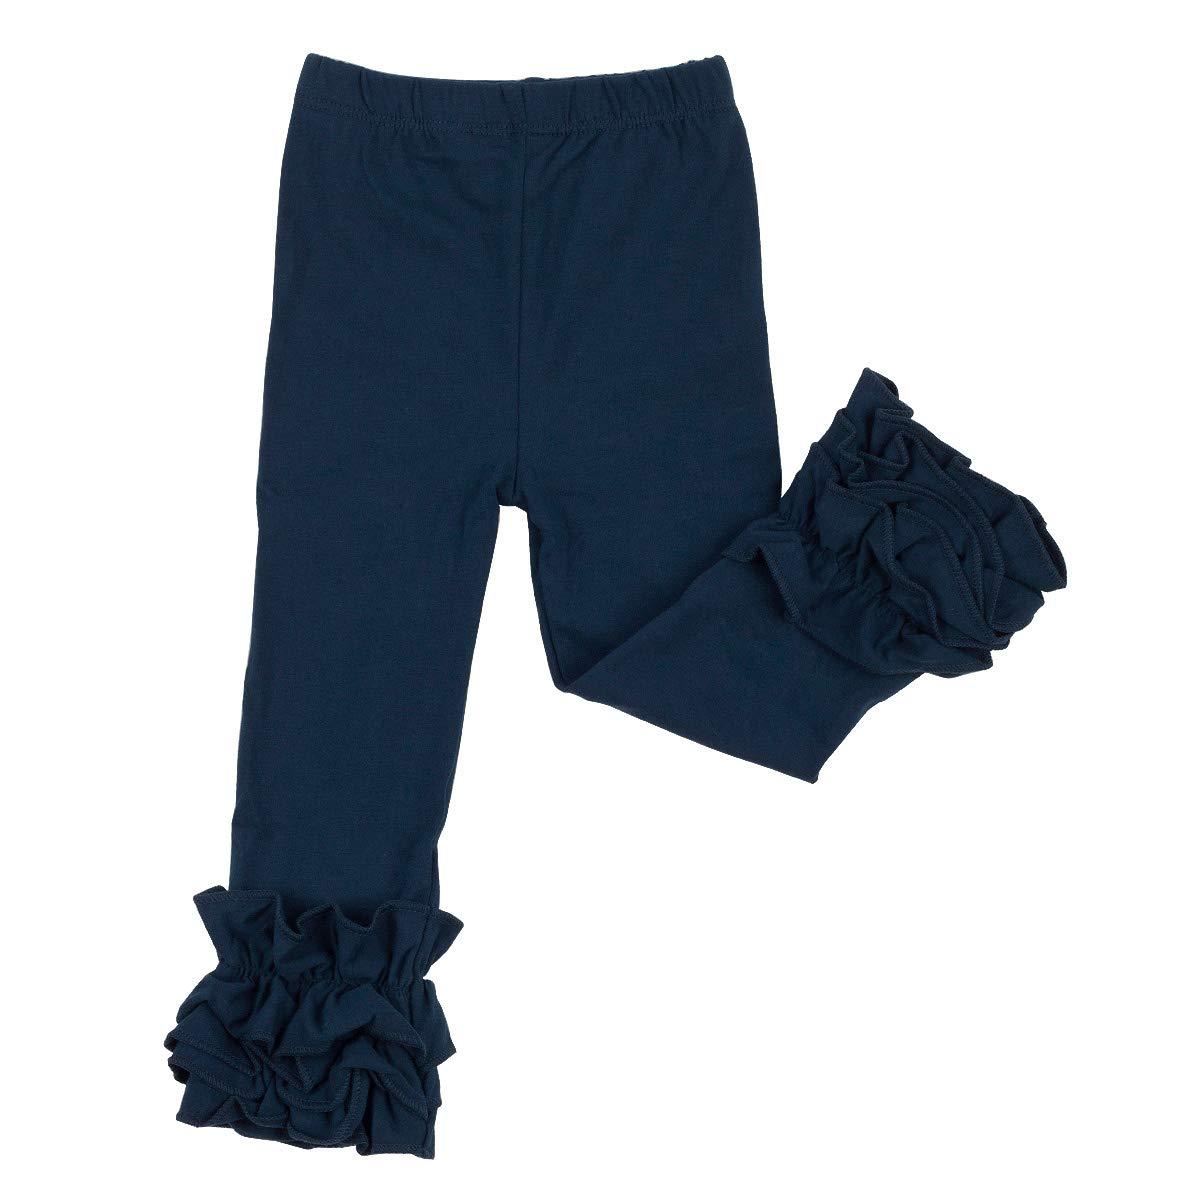 e4b403085e251 Slowera Little Girls' Ruffle Leggings Baby Toddler Solid Color Flower Pants  product image